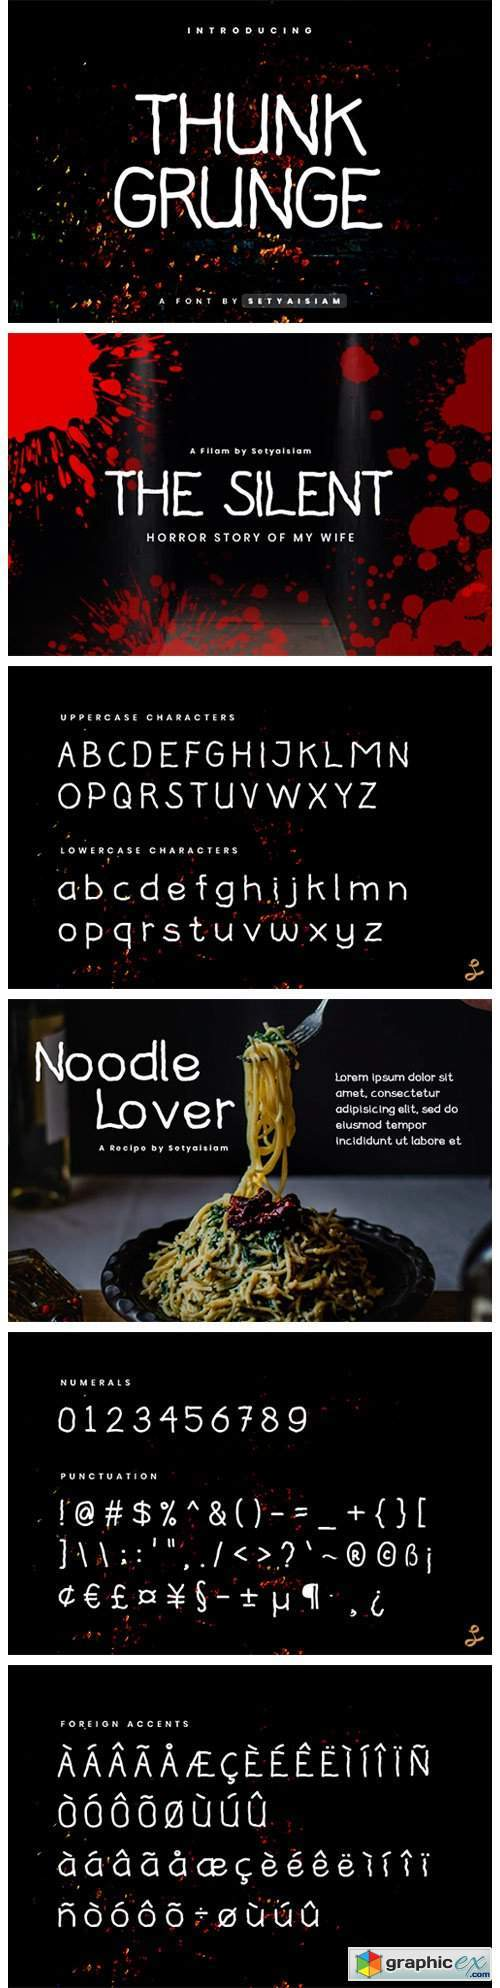 Thunk Grunge Font